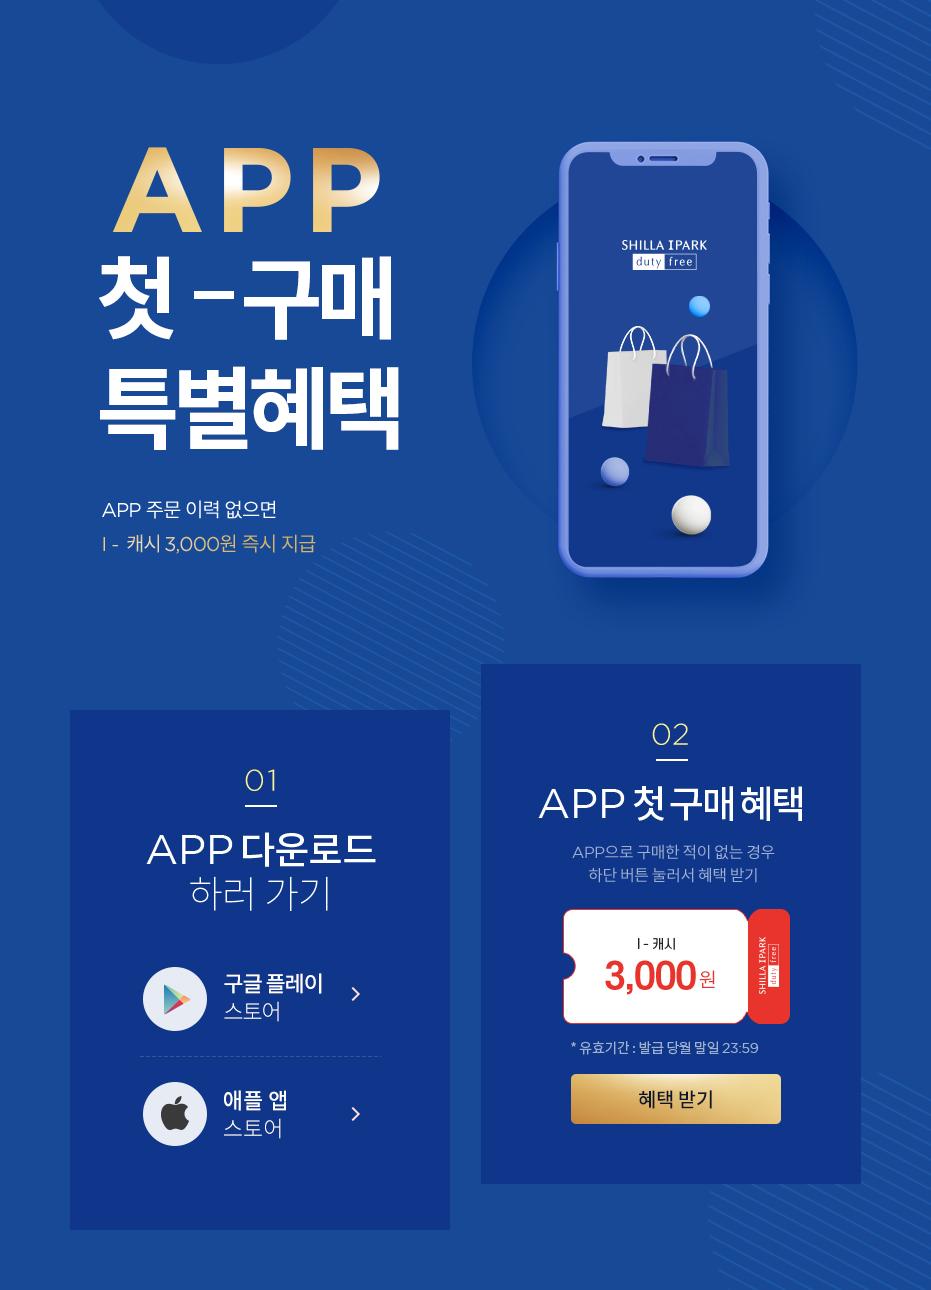 APP 첫구매 특별혜택